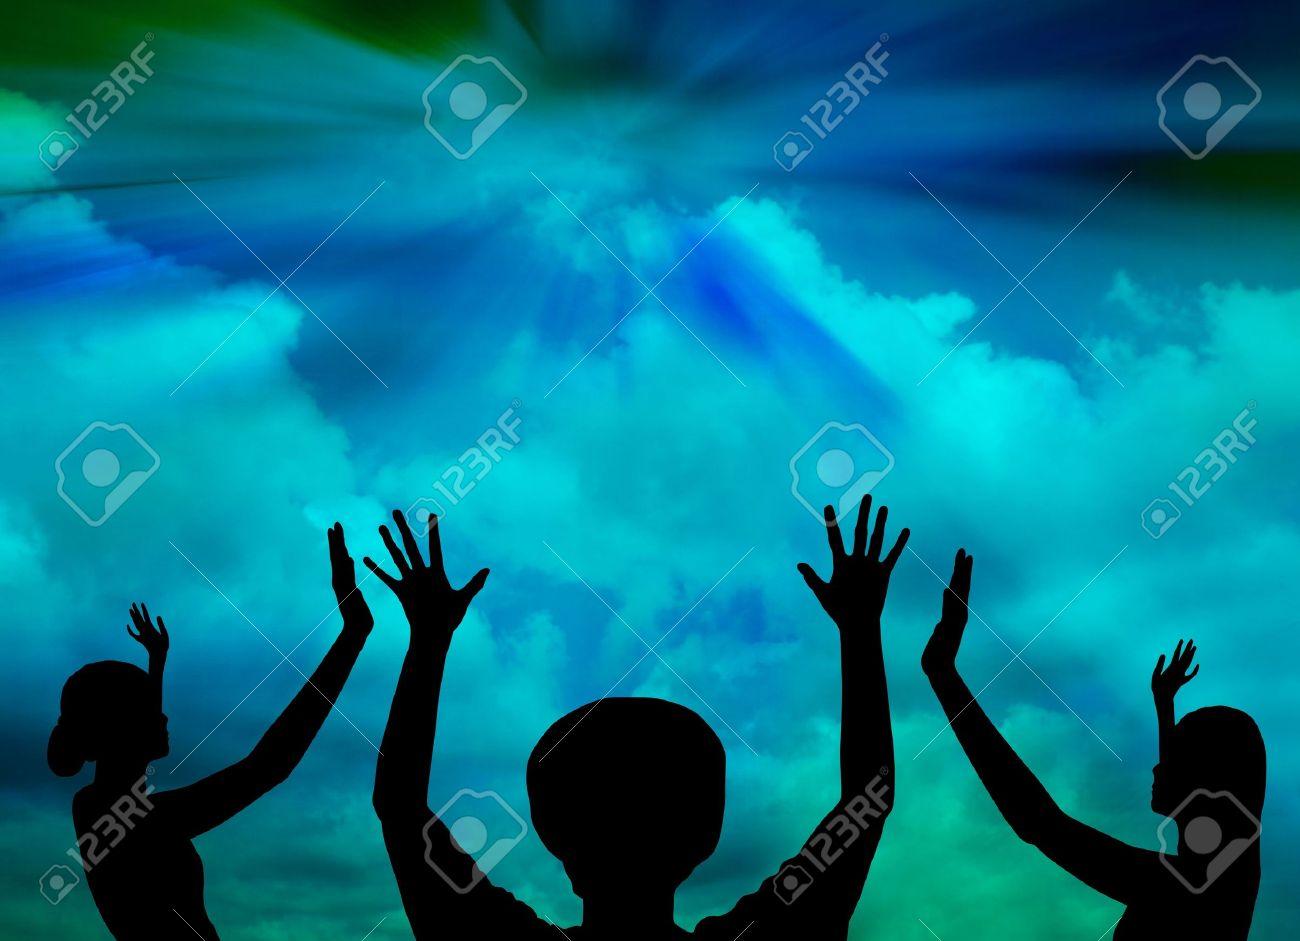 praise god images u0026 stock pictures royalty free praise god photos